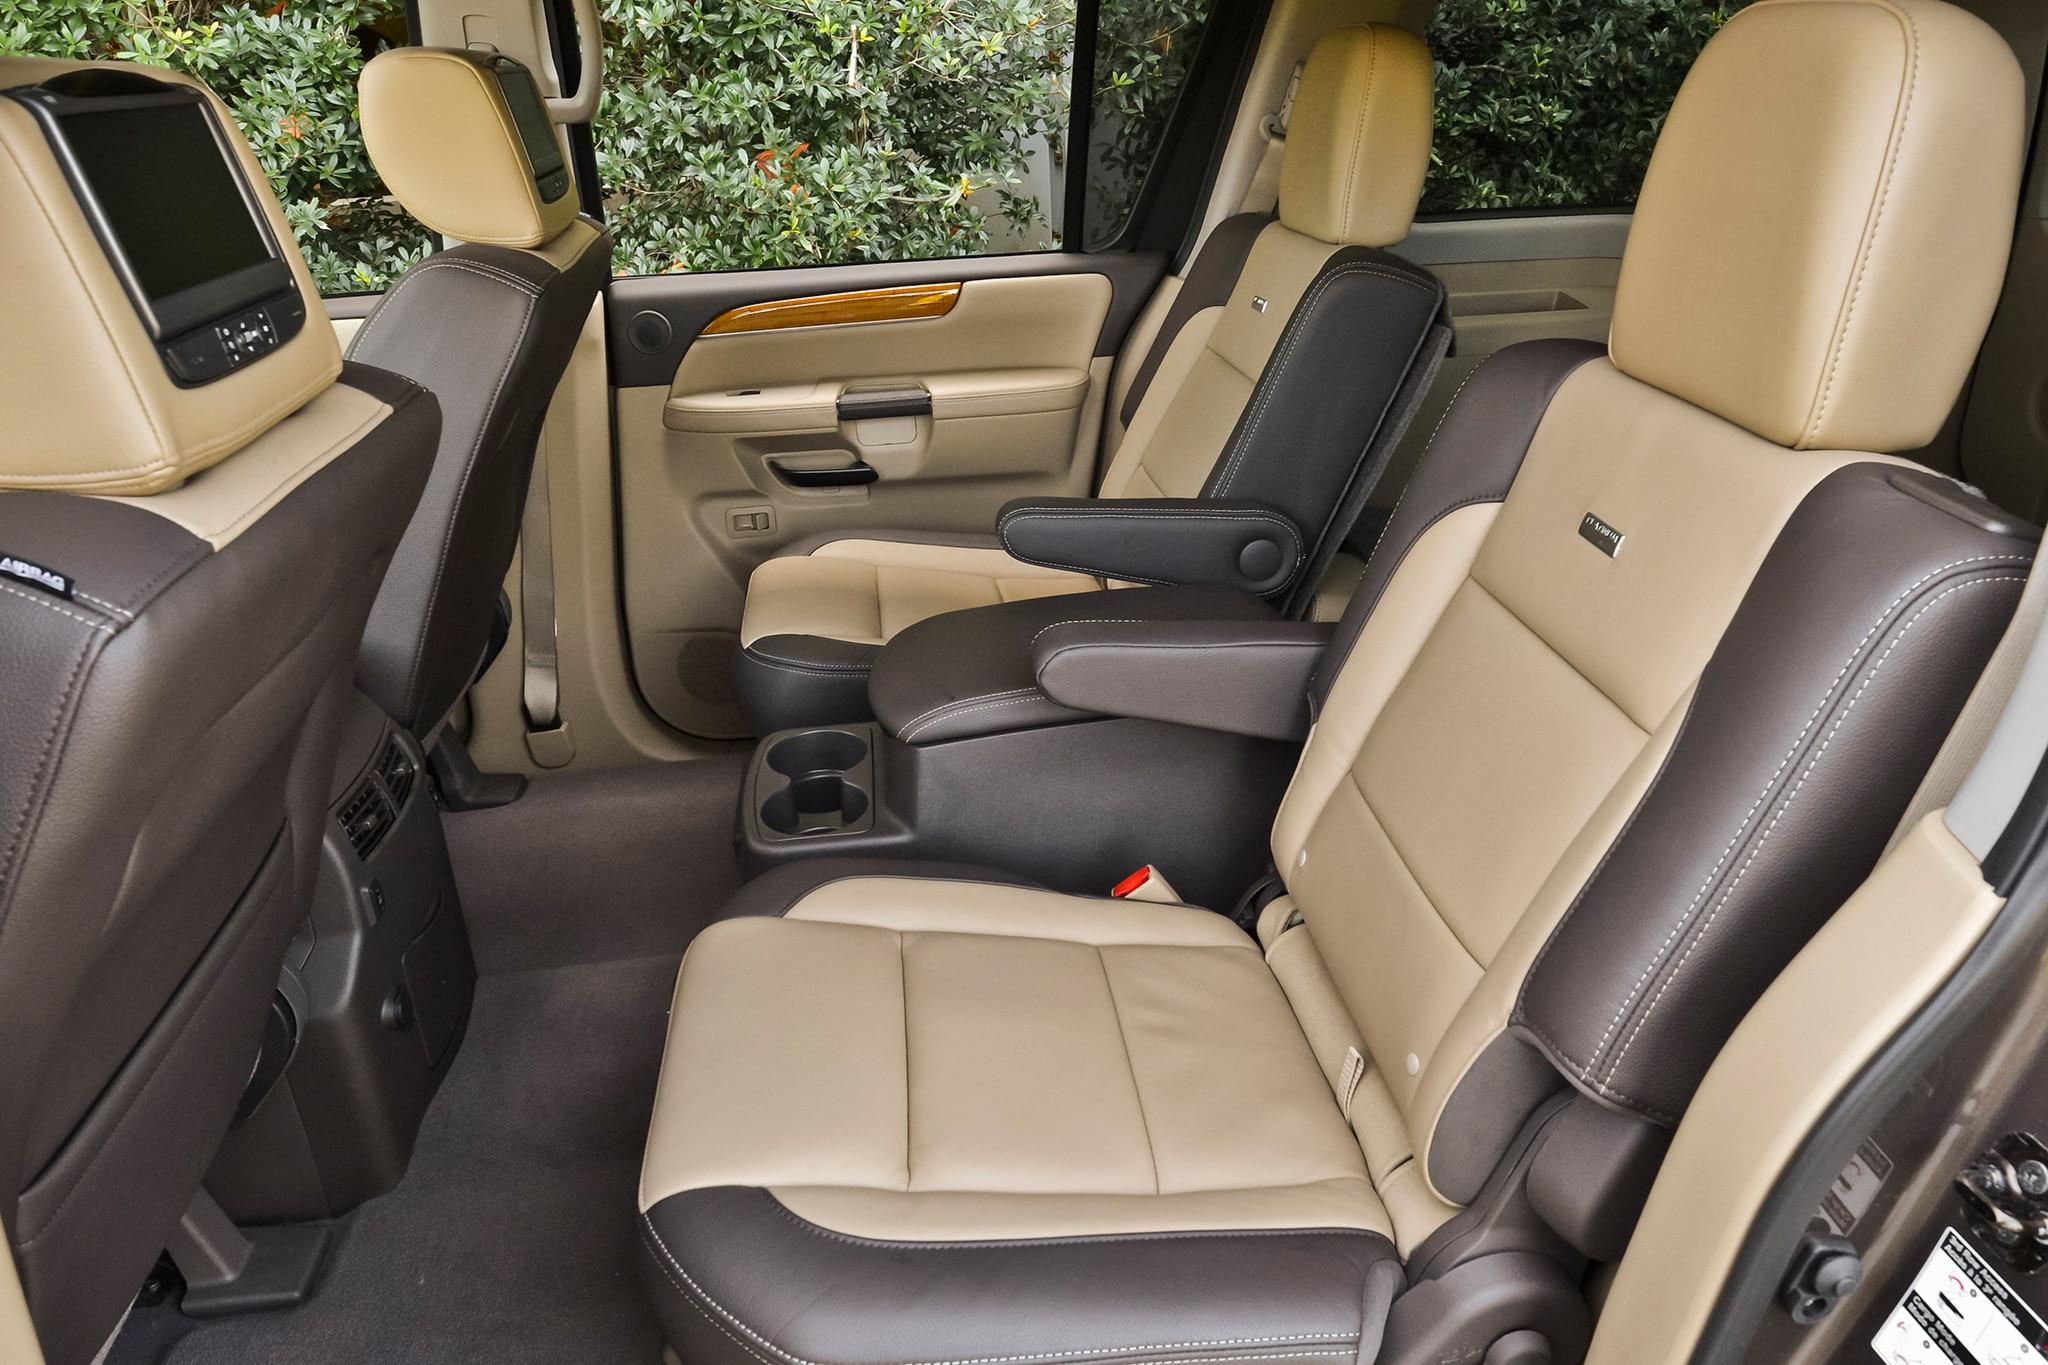 2015 Nissan Armada Base Price Rises Slightly To 39 055